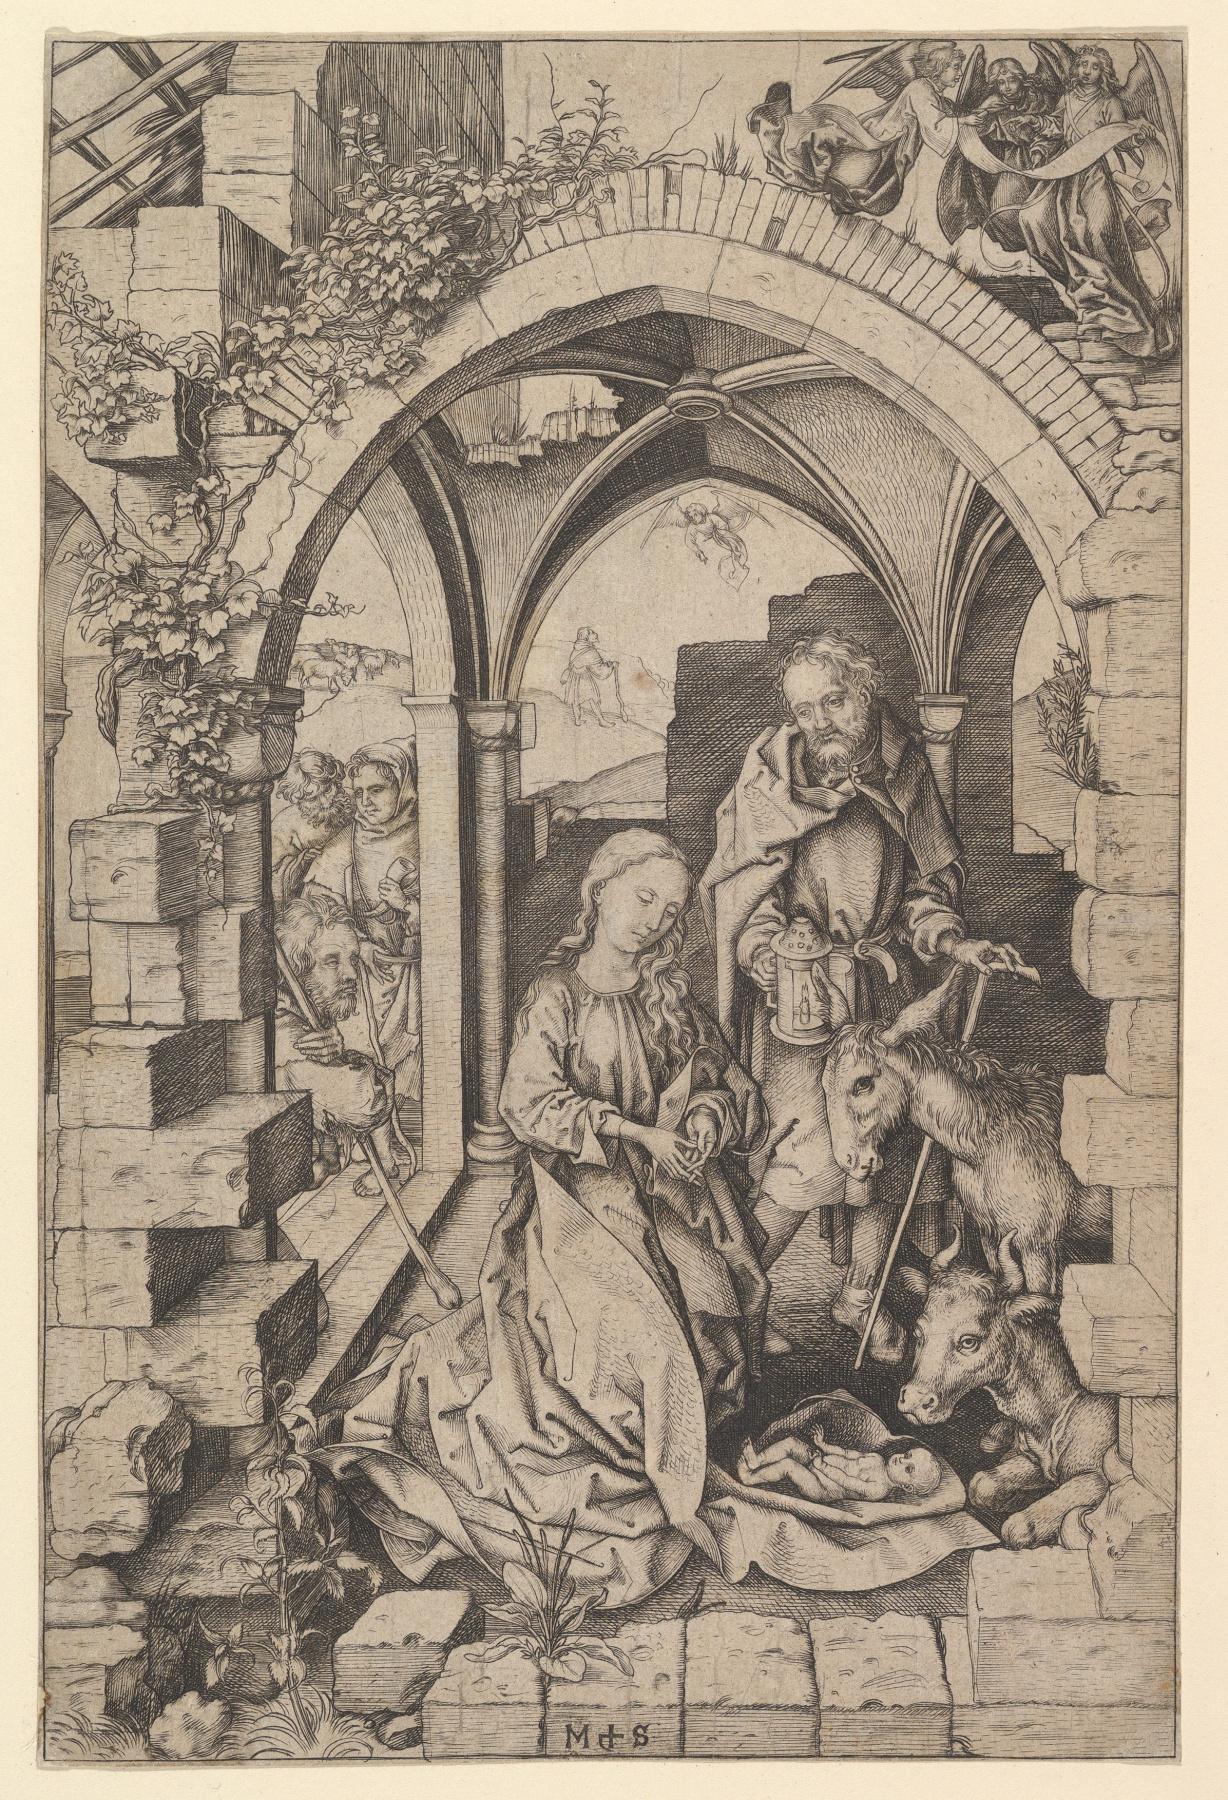 Martin Schongauer. Christmas